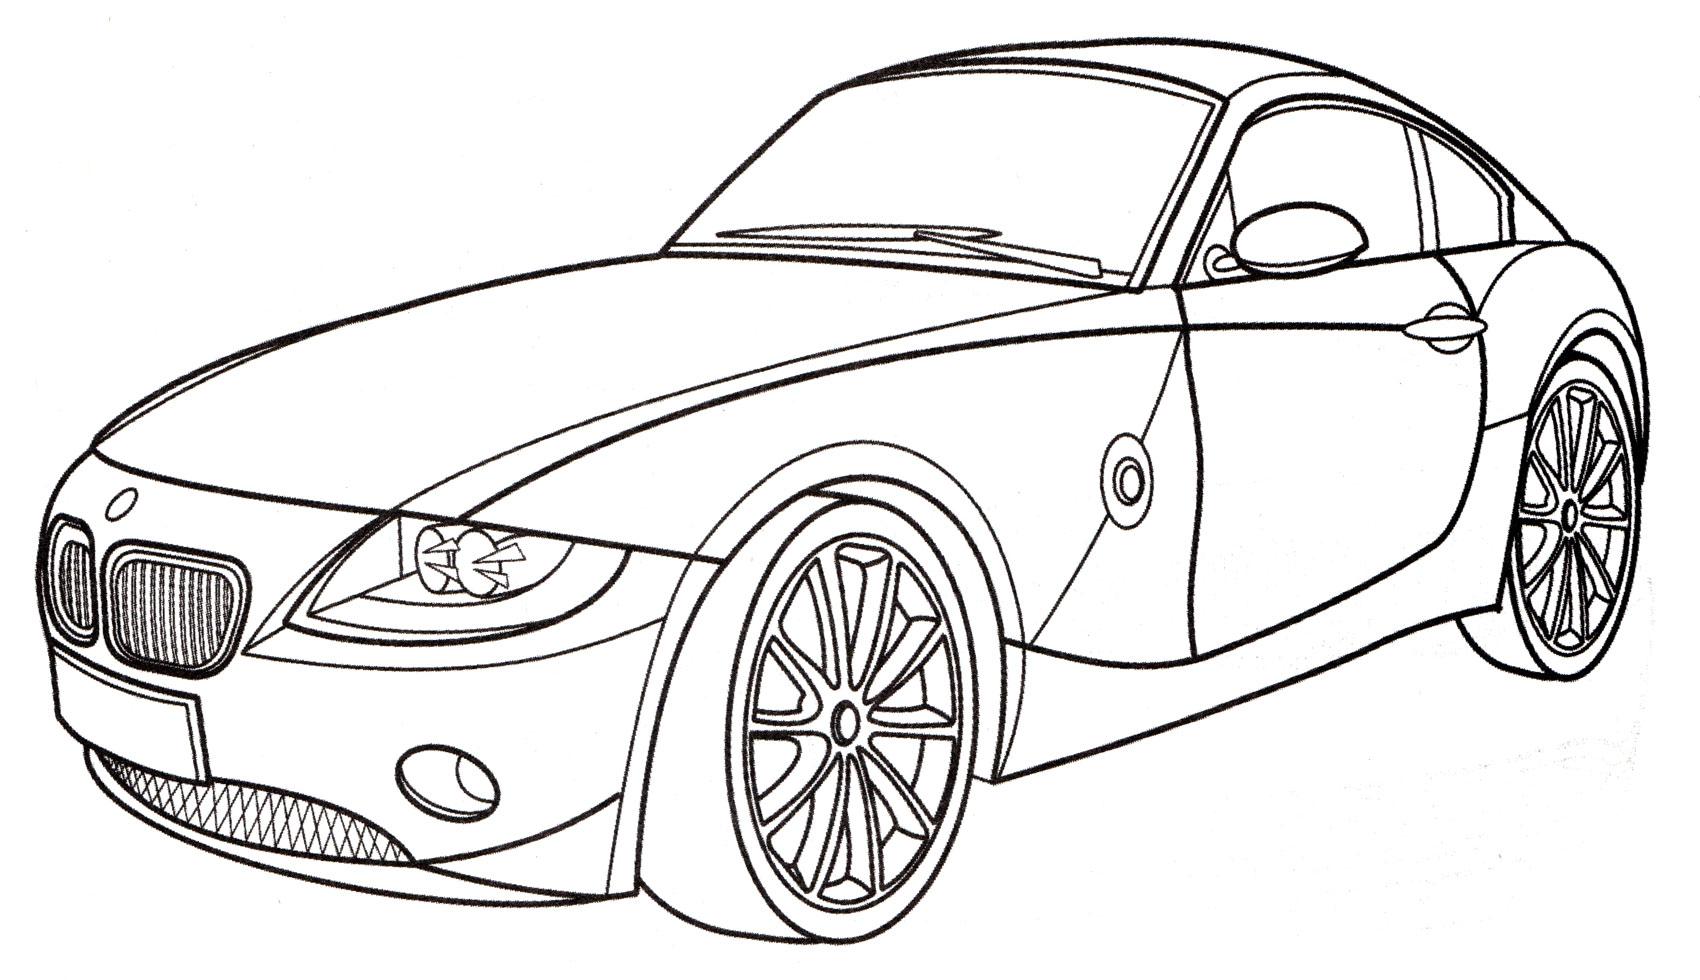 Раскраска БМВ Z4 Roadster